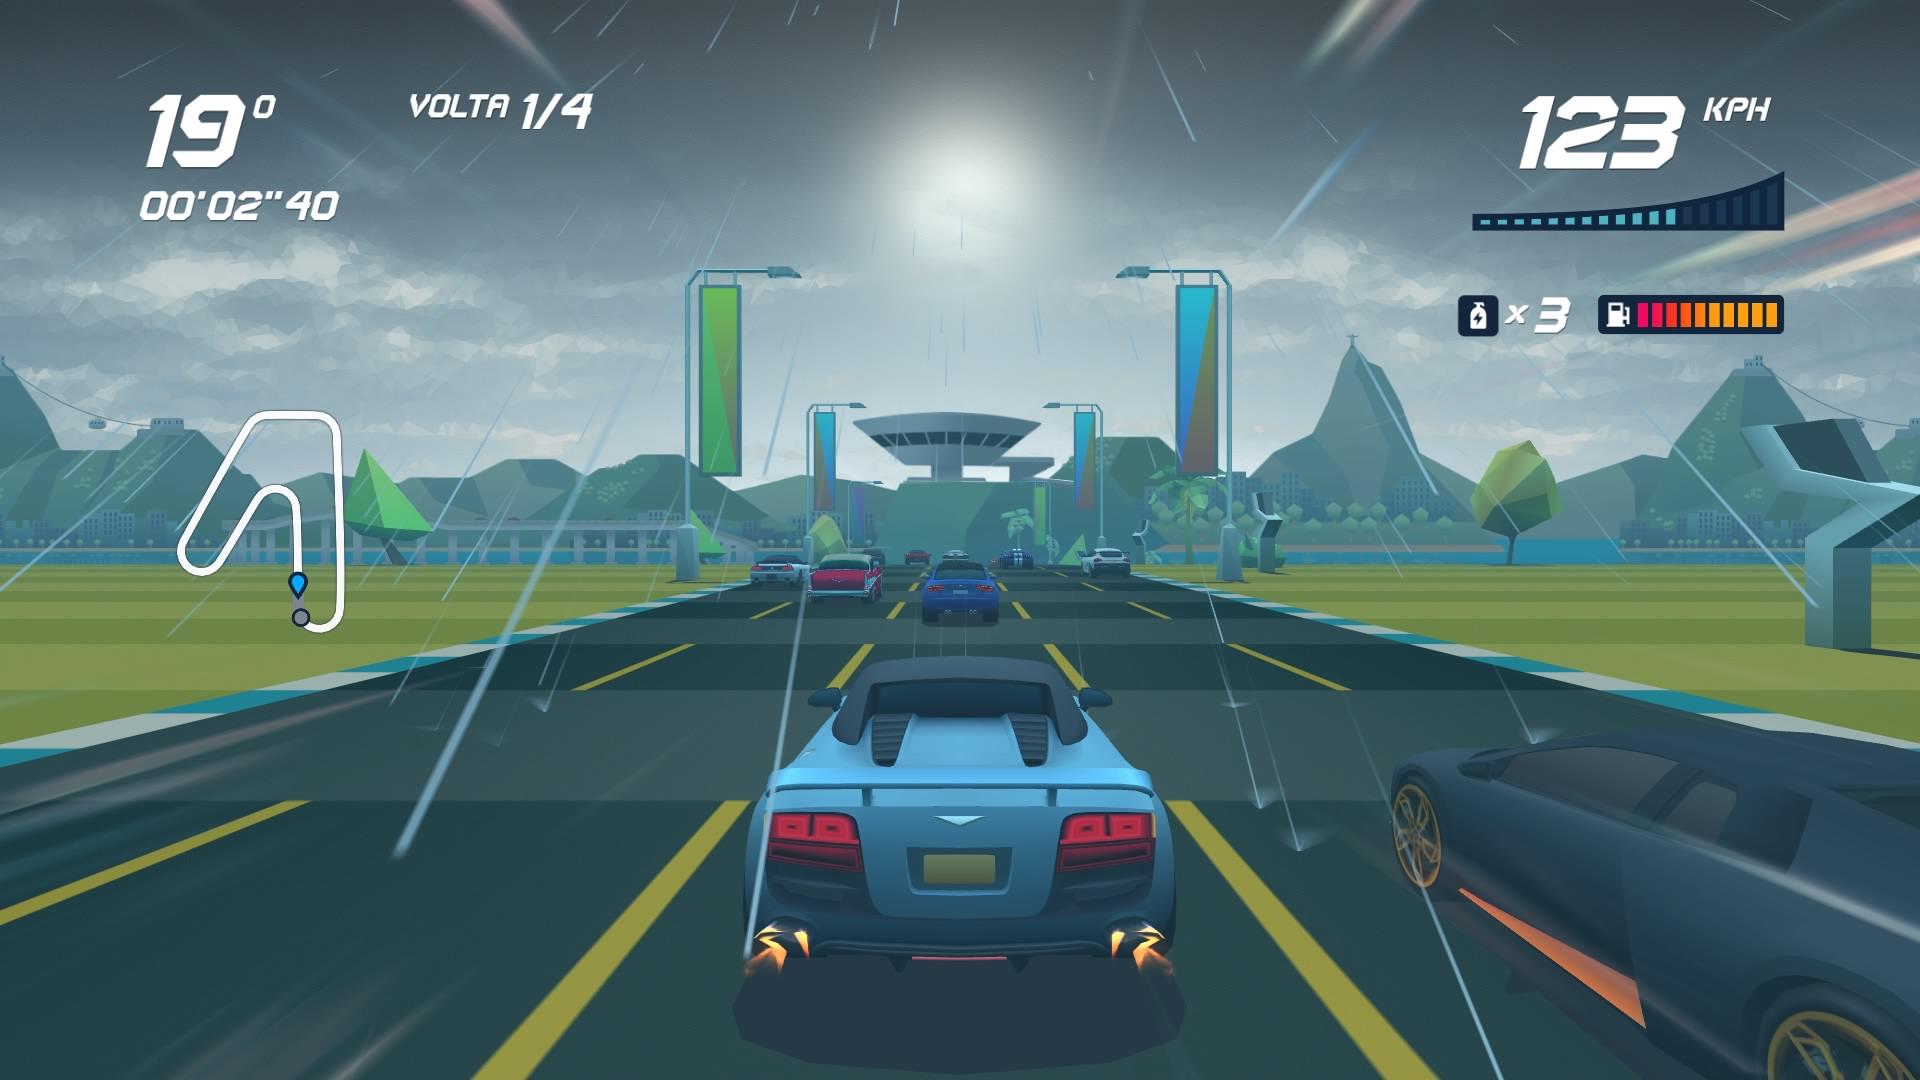 Horizon Chase Turbo: Vale a Pena? 9